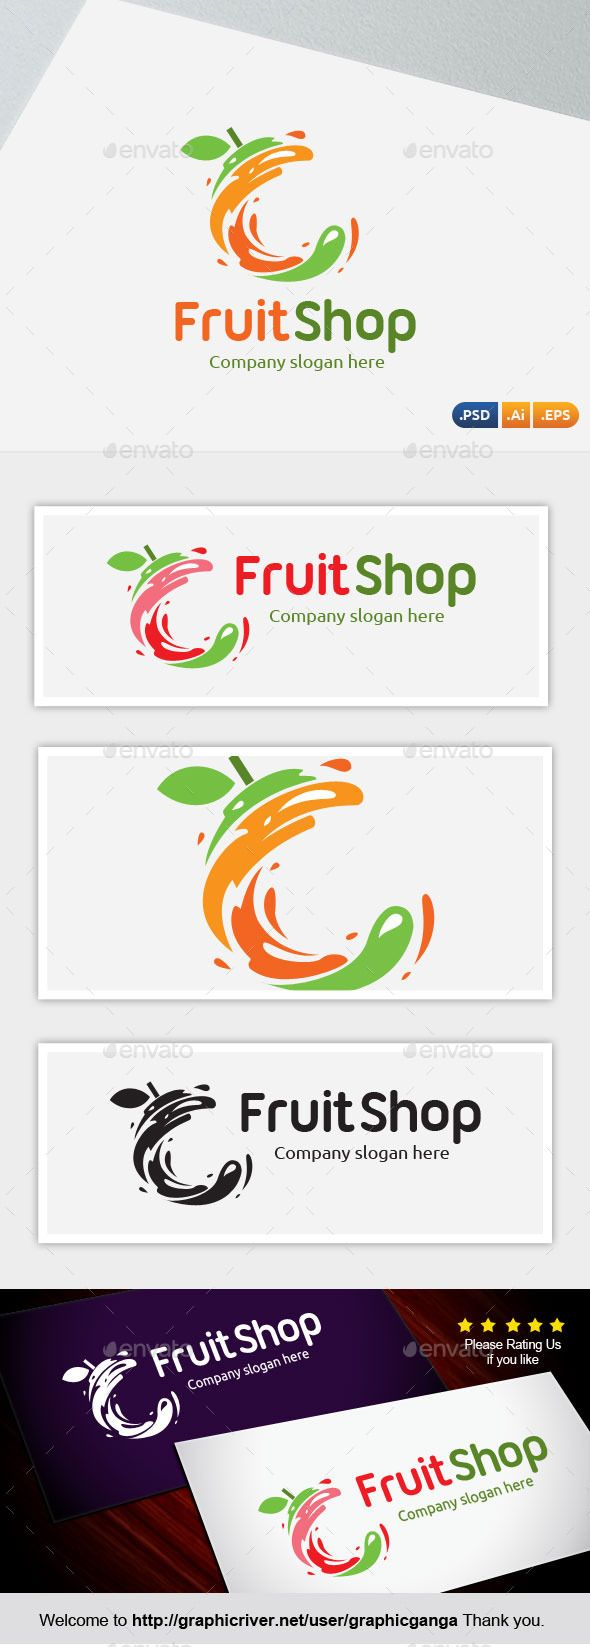 best 25  logo templates ideas on pinterest